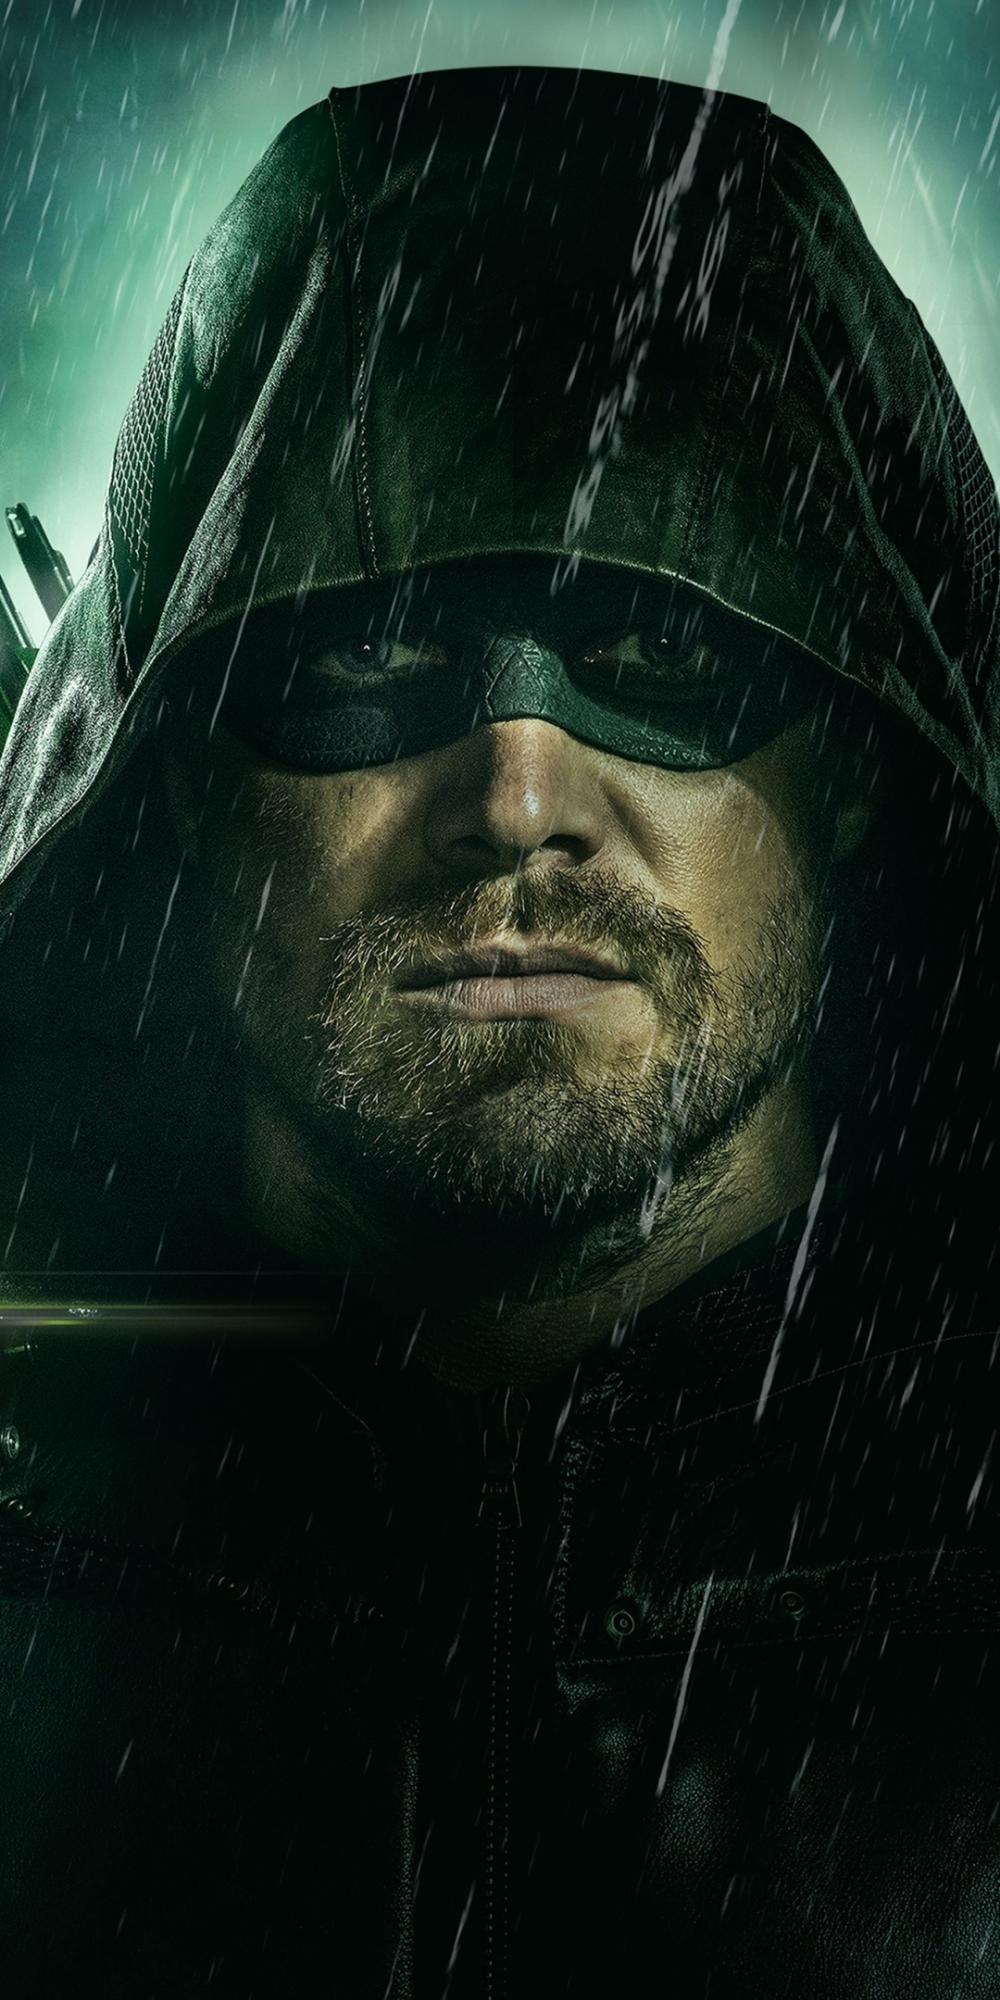 1080x2160 Tv Show Arrow Season 8 2019 Wallpaper Green Arrow Arrow Tv Arrow